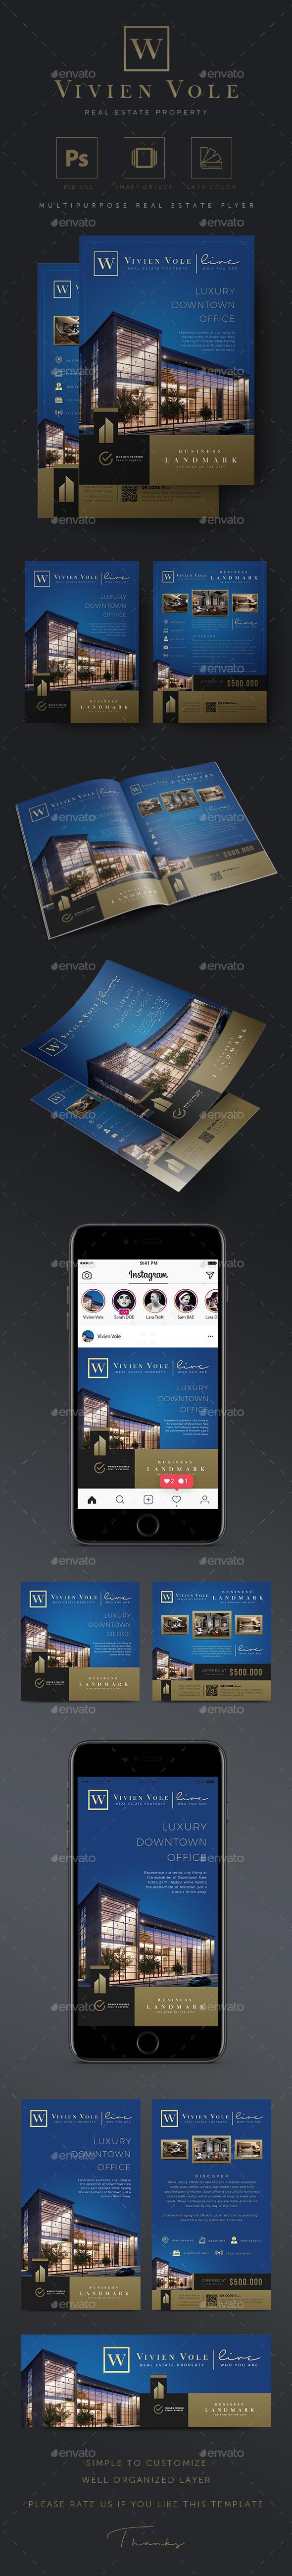 Business Landmark - Creative Real Estate Flyer - Commerce Flyers